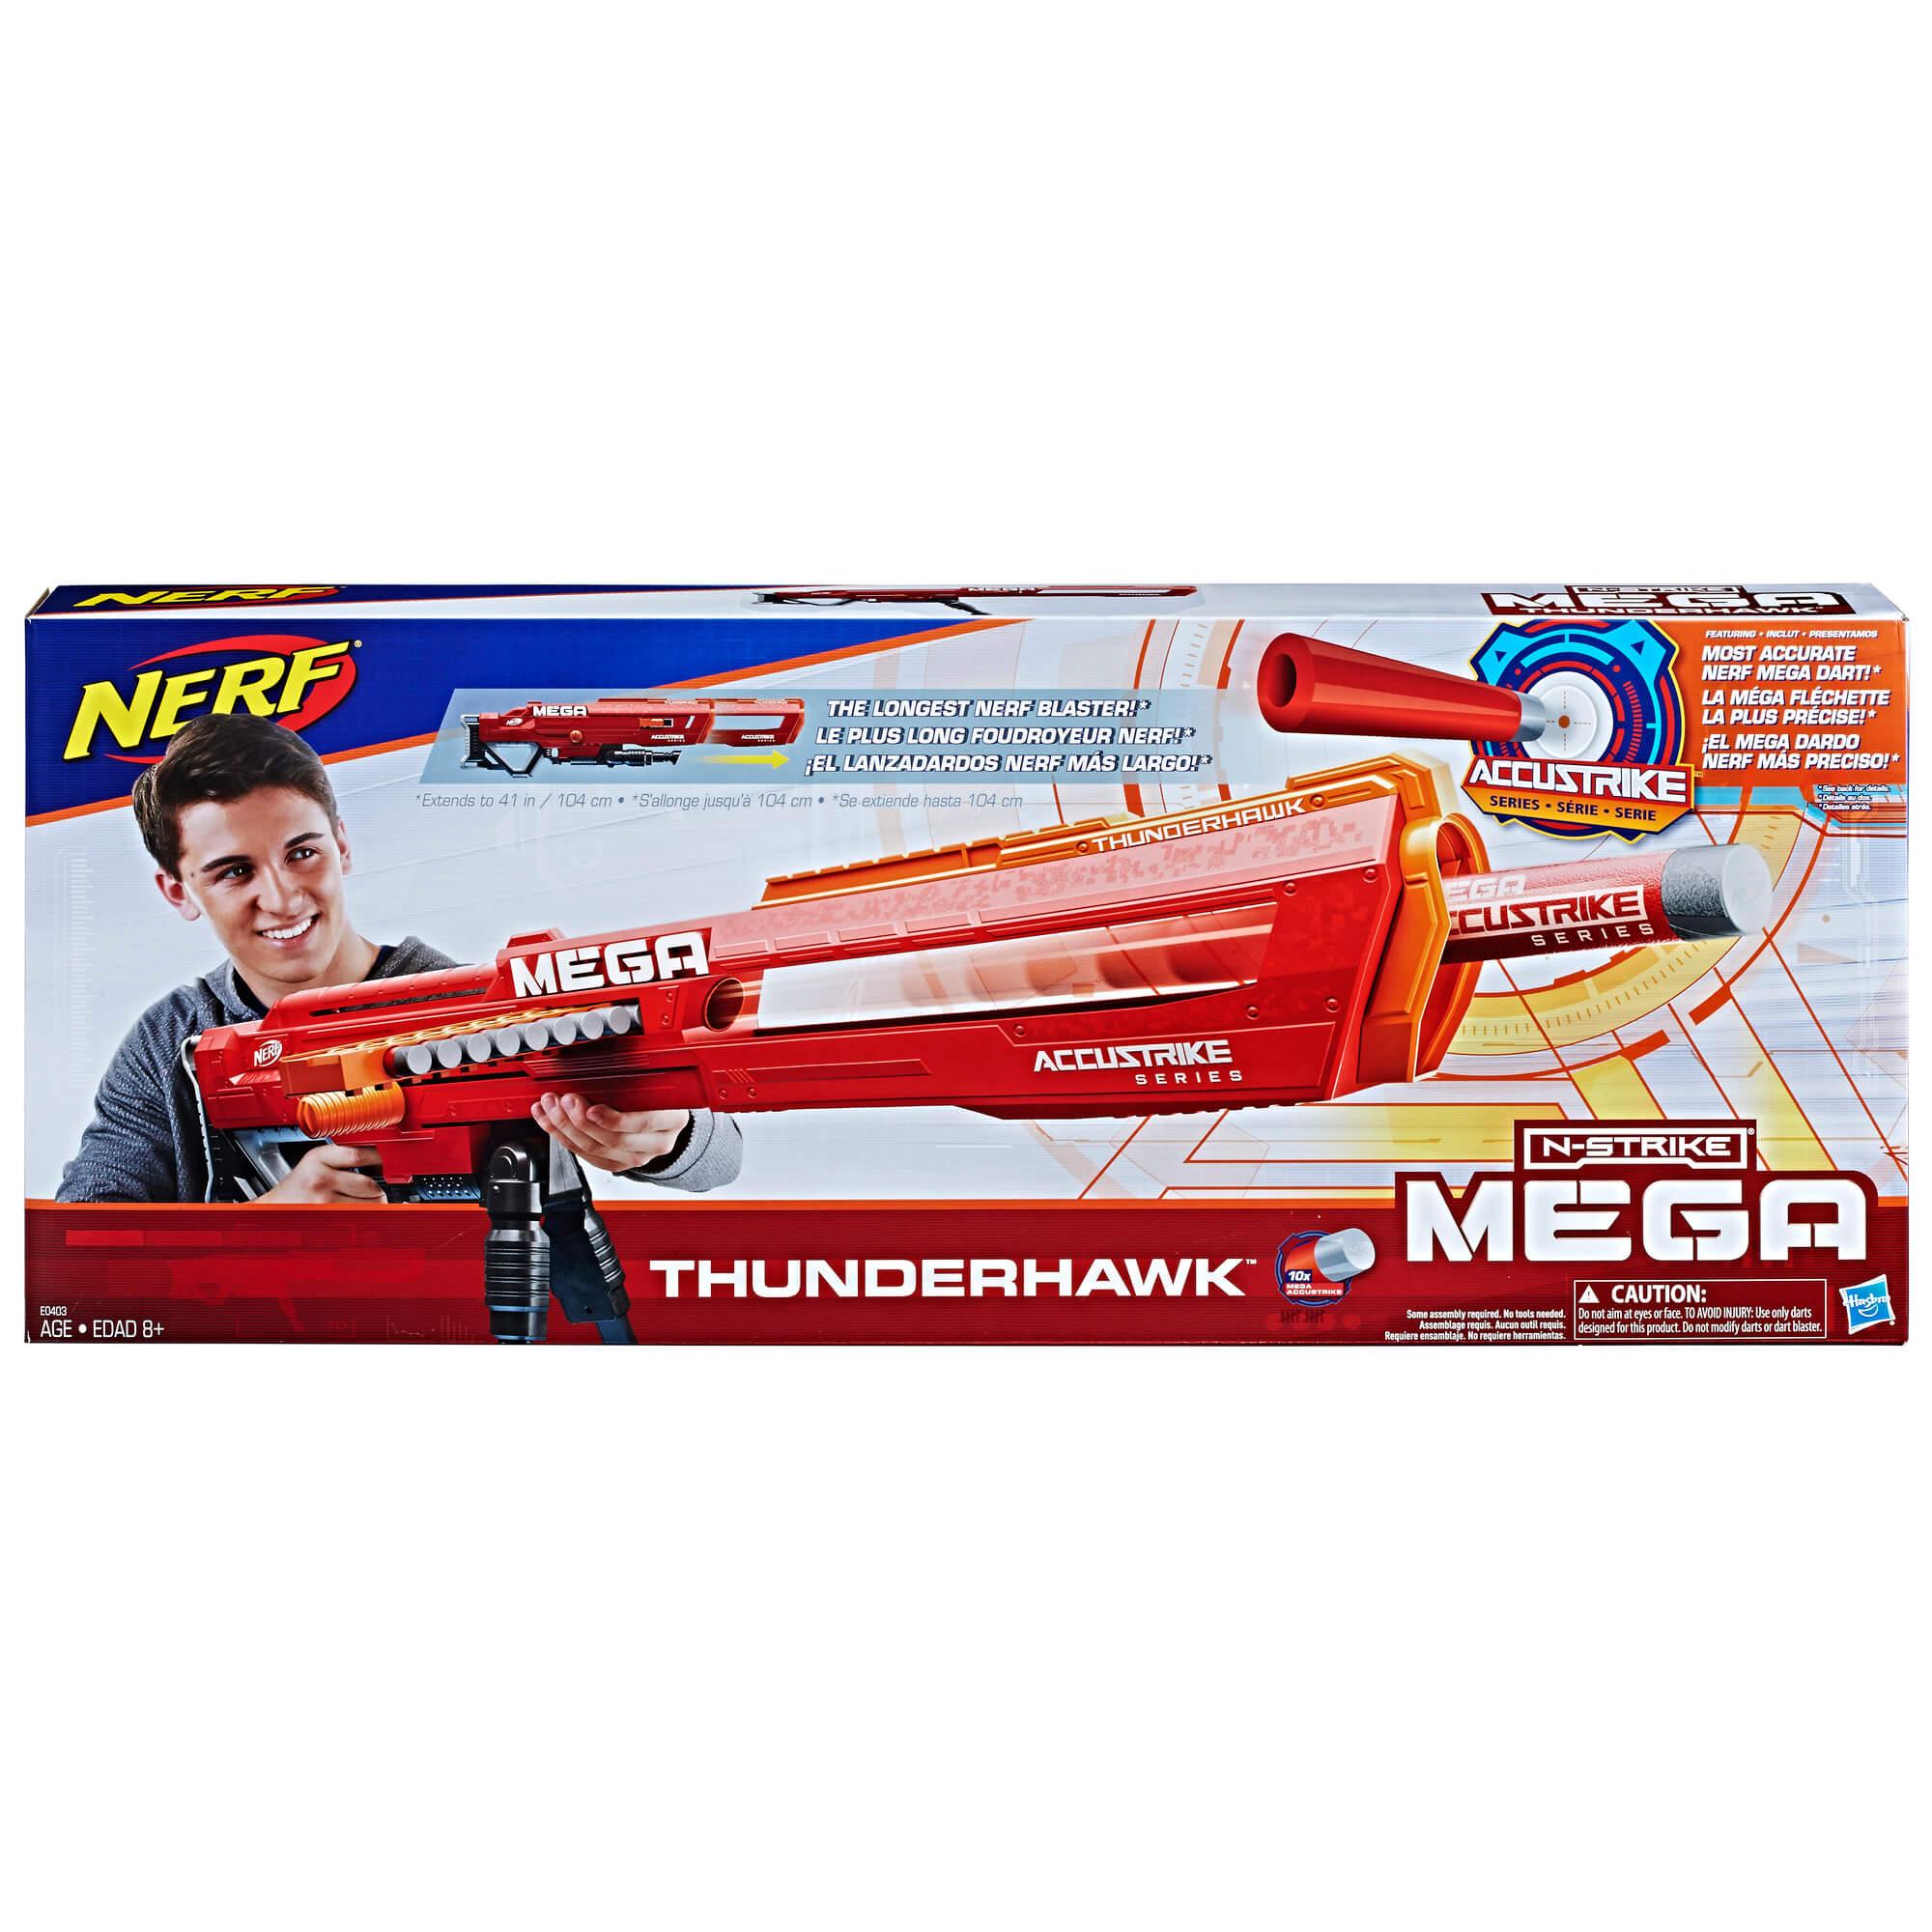 Mua đồ chơi súng NERF E0403 - (Mã: E0403) Súng NERF MEGA AccuStrike Thunderhawk (dòng MEGA N-Strike Elite)